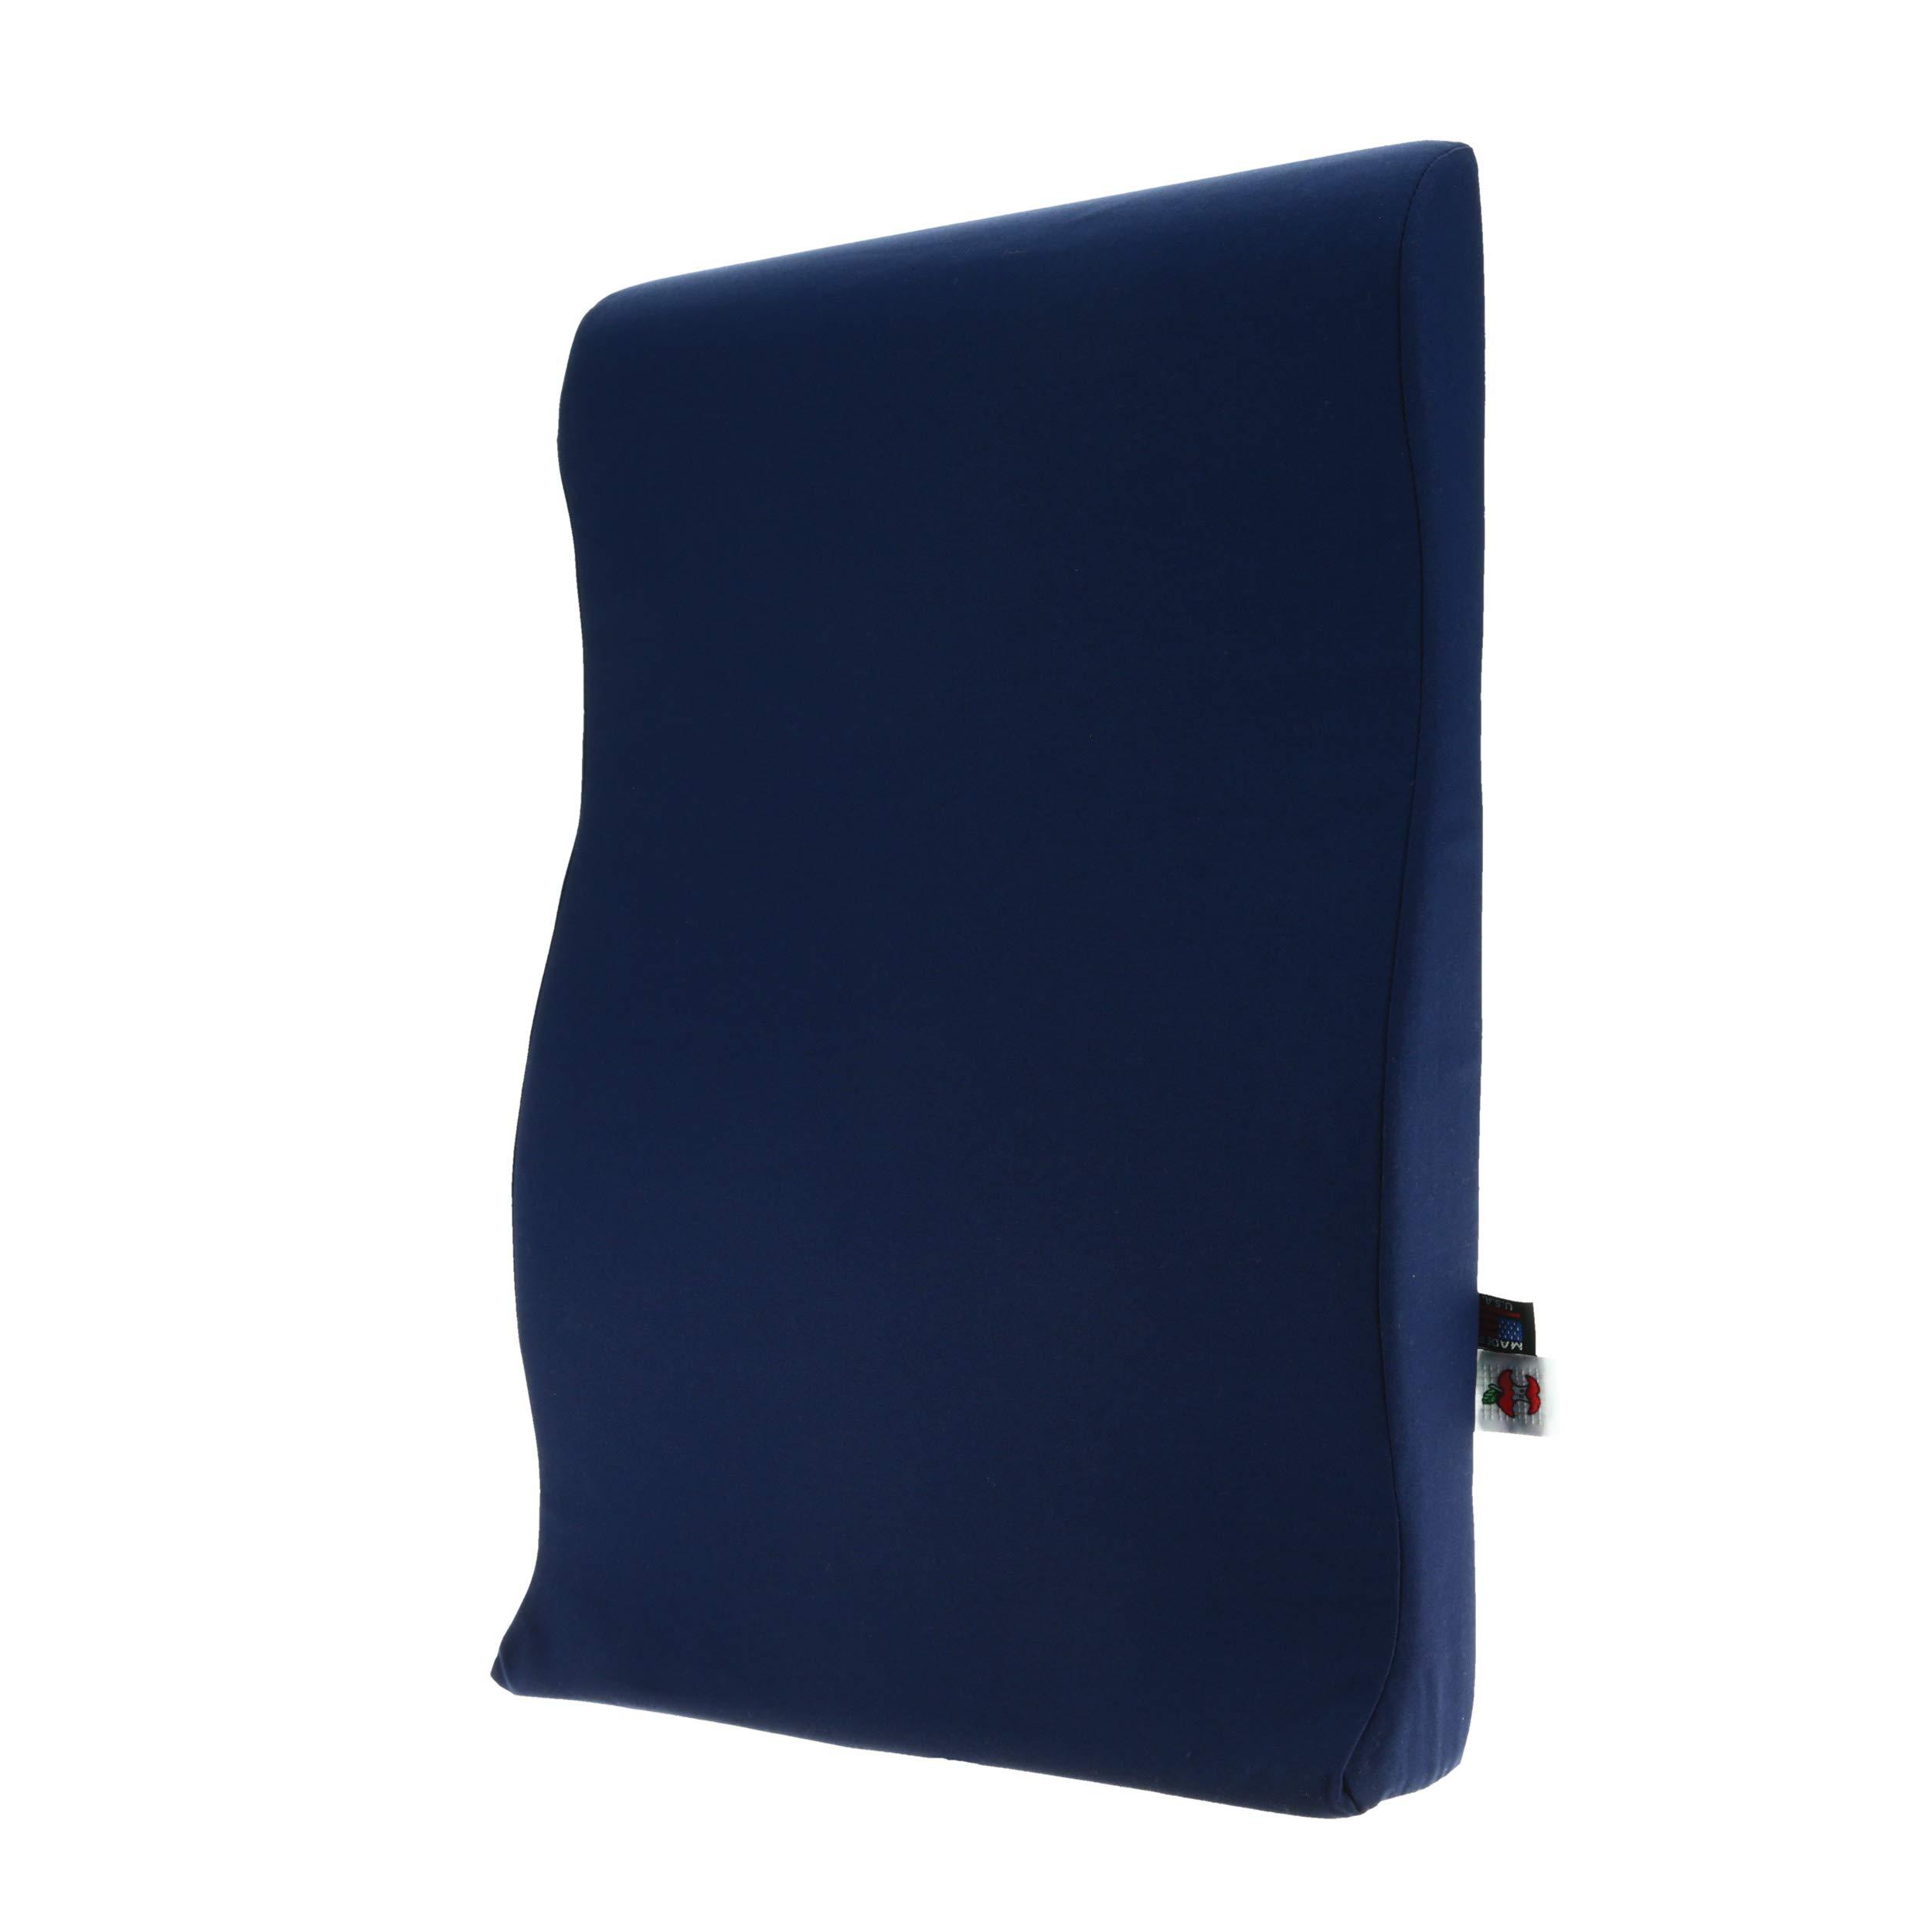 Core Products Hibak Rest, Lumbar Support - Blue